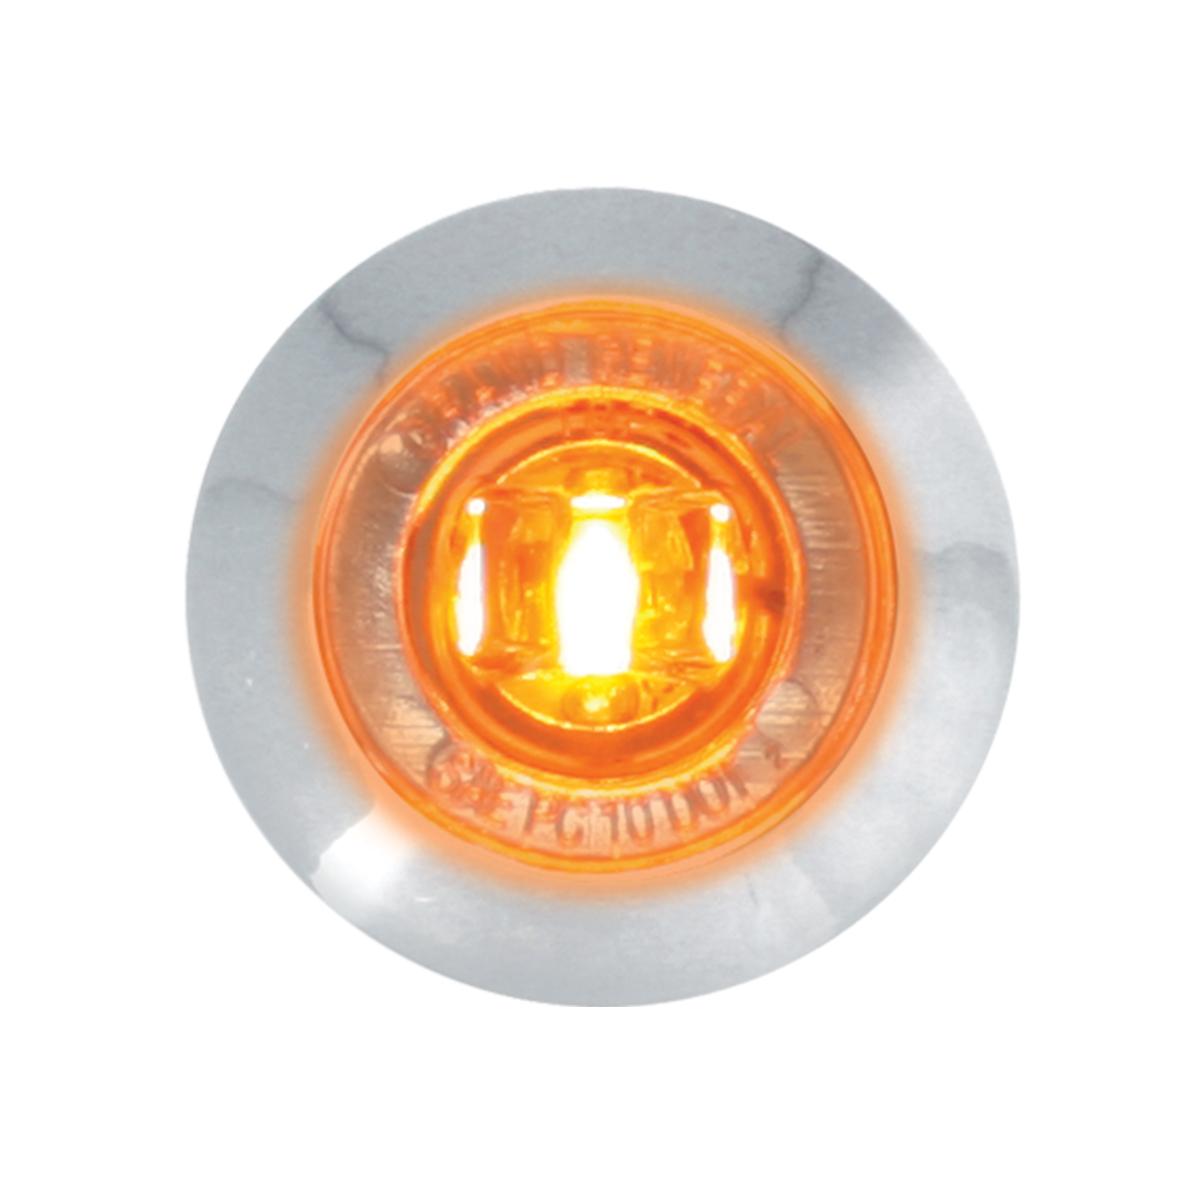 "87061 Amber/Clear 1"" Dia. Mini Push/Screw-in Wide Angle LED Marker Light w/ Chrome Bezel"